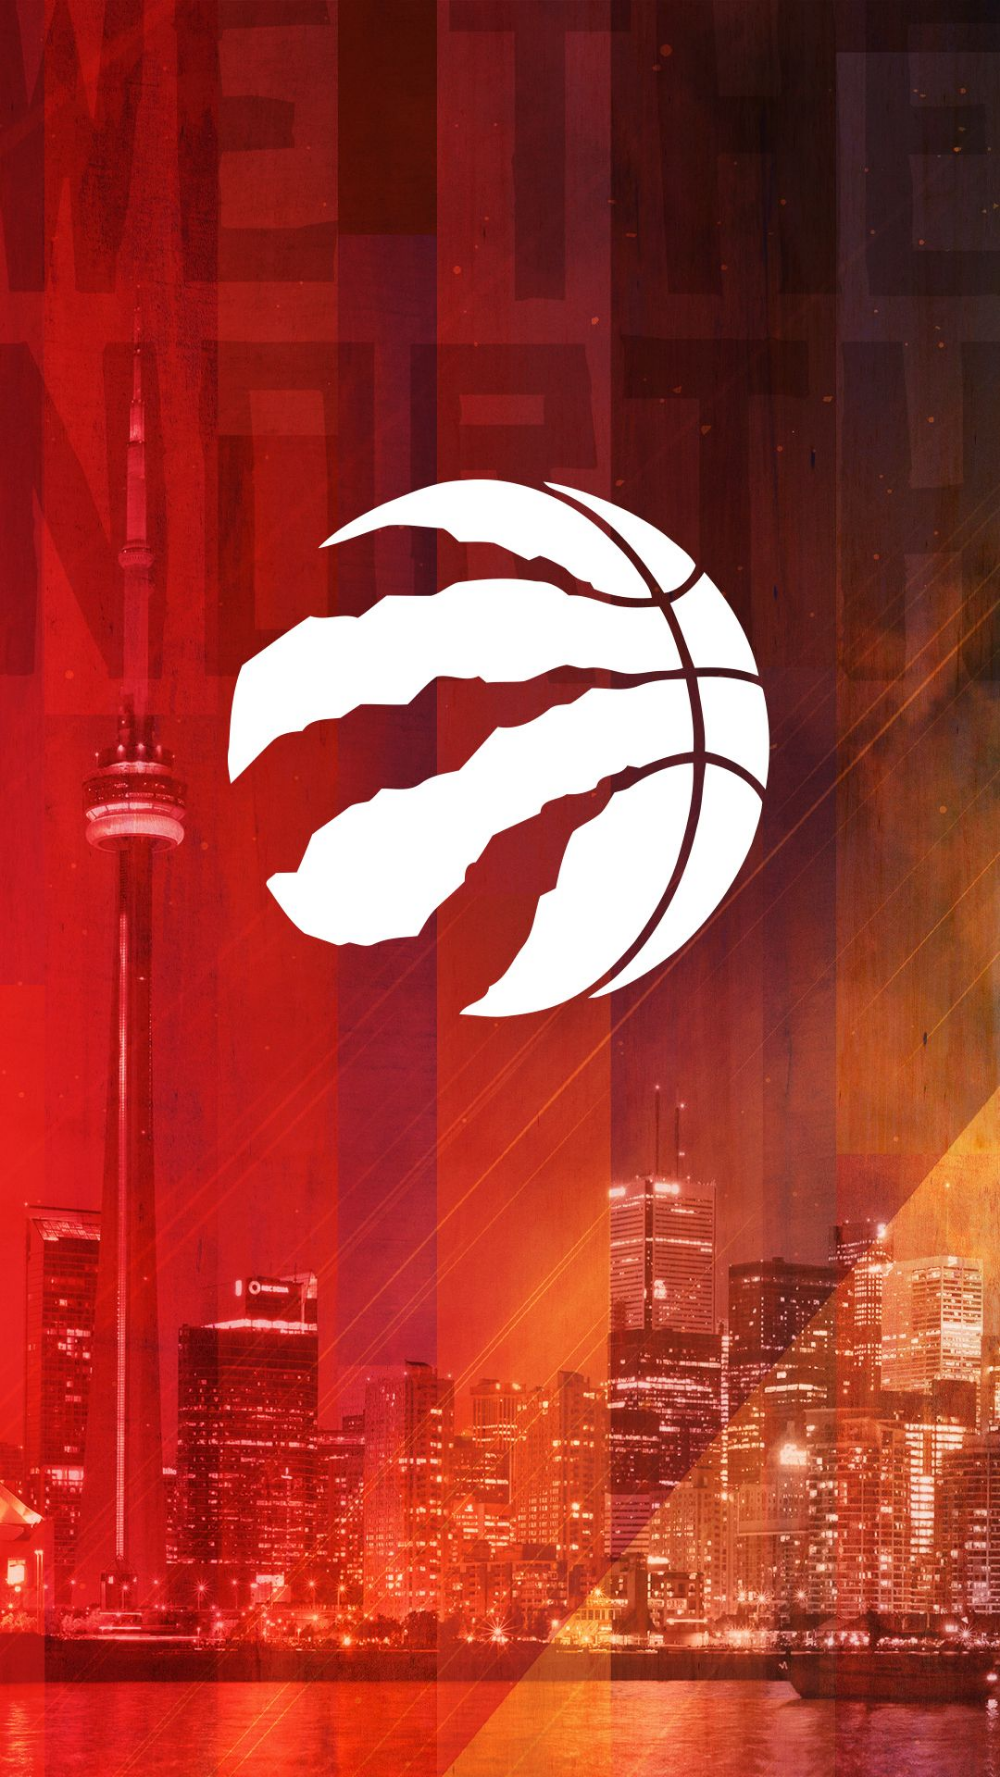 Raptors Google Search Toronto Raptors Basketball Raptors Wallpaper Raptors Basketball